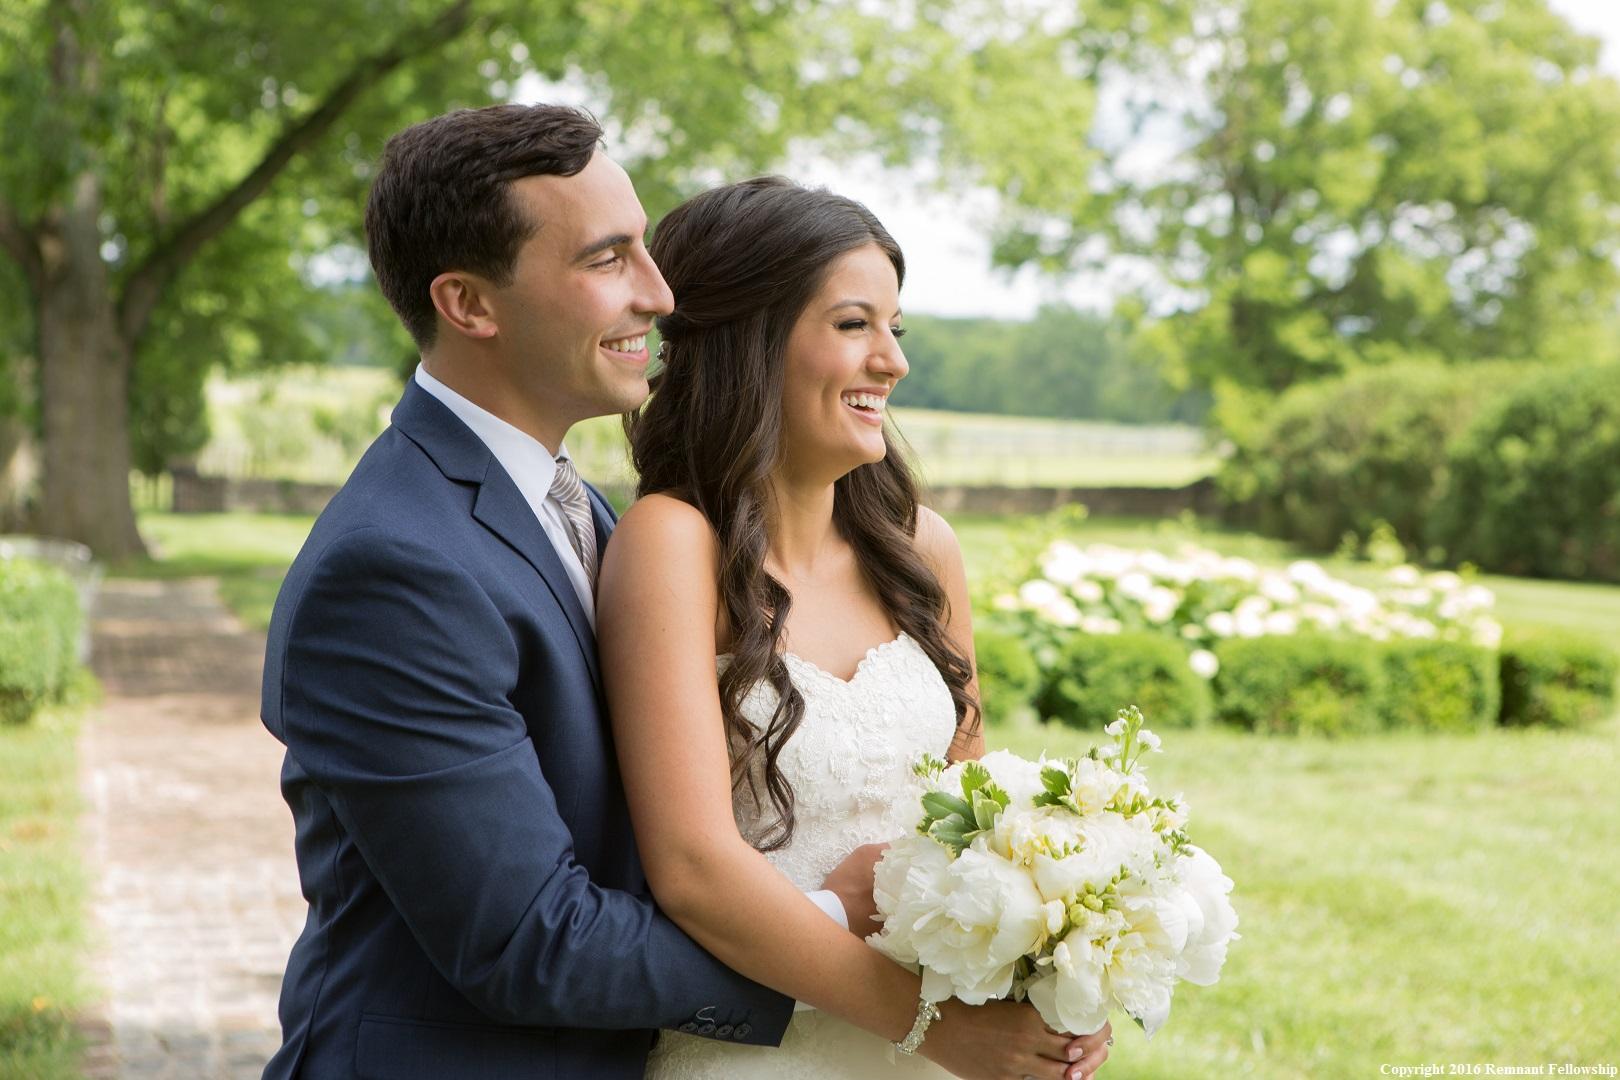 Remnant-Fellowship-weddings-radebaugh-betancourt-prewedding05